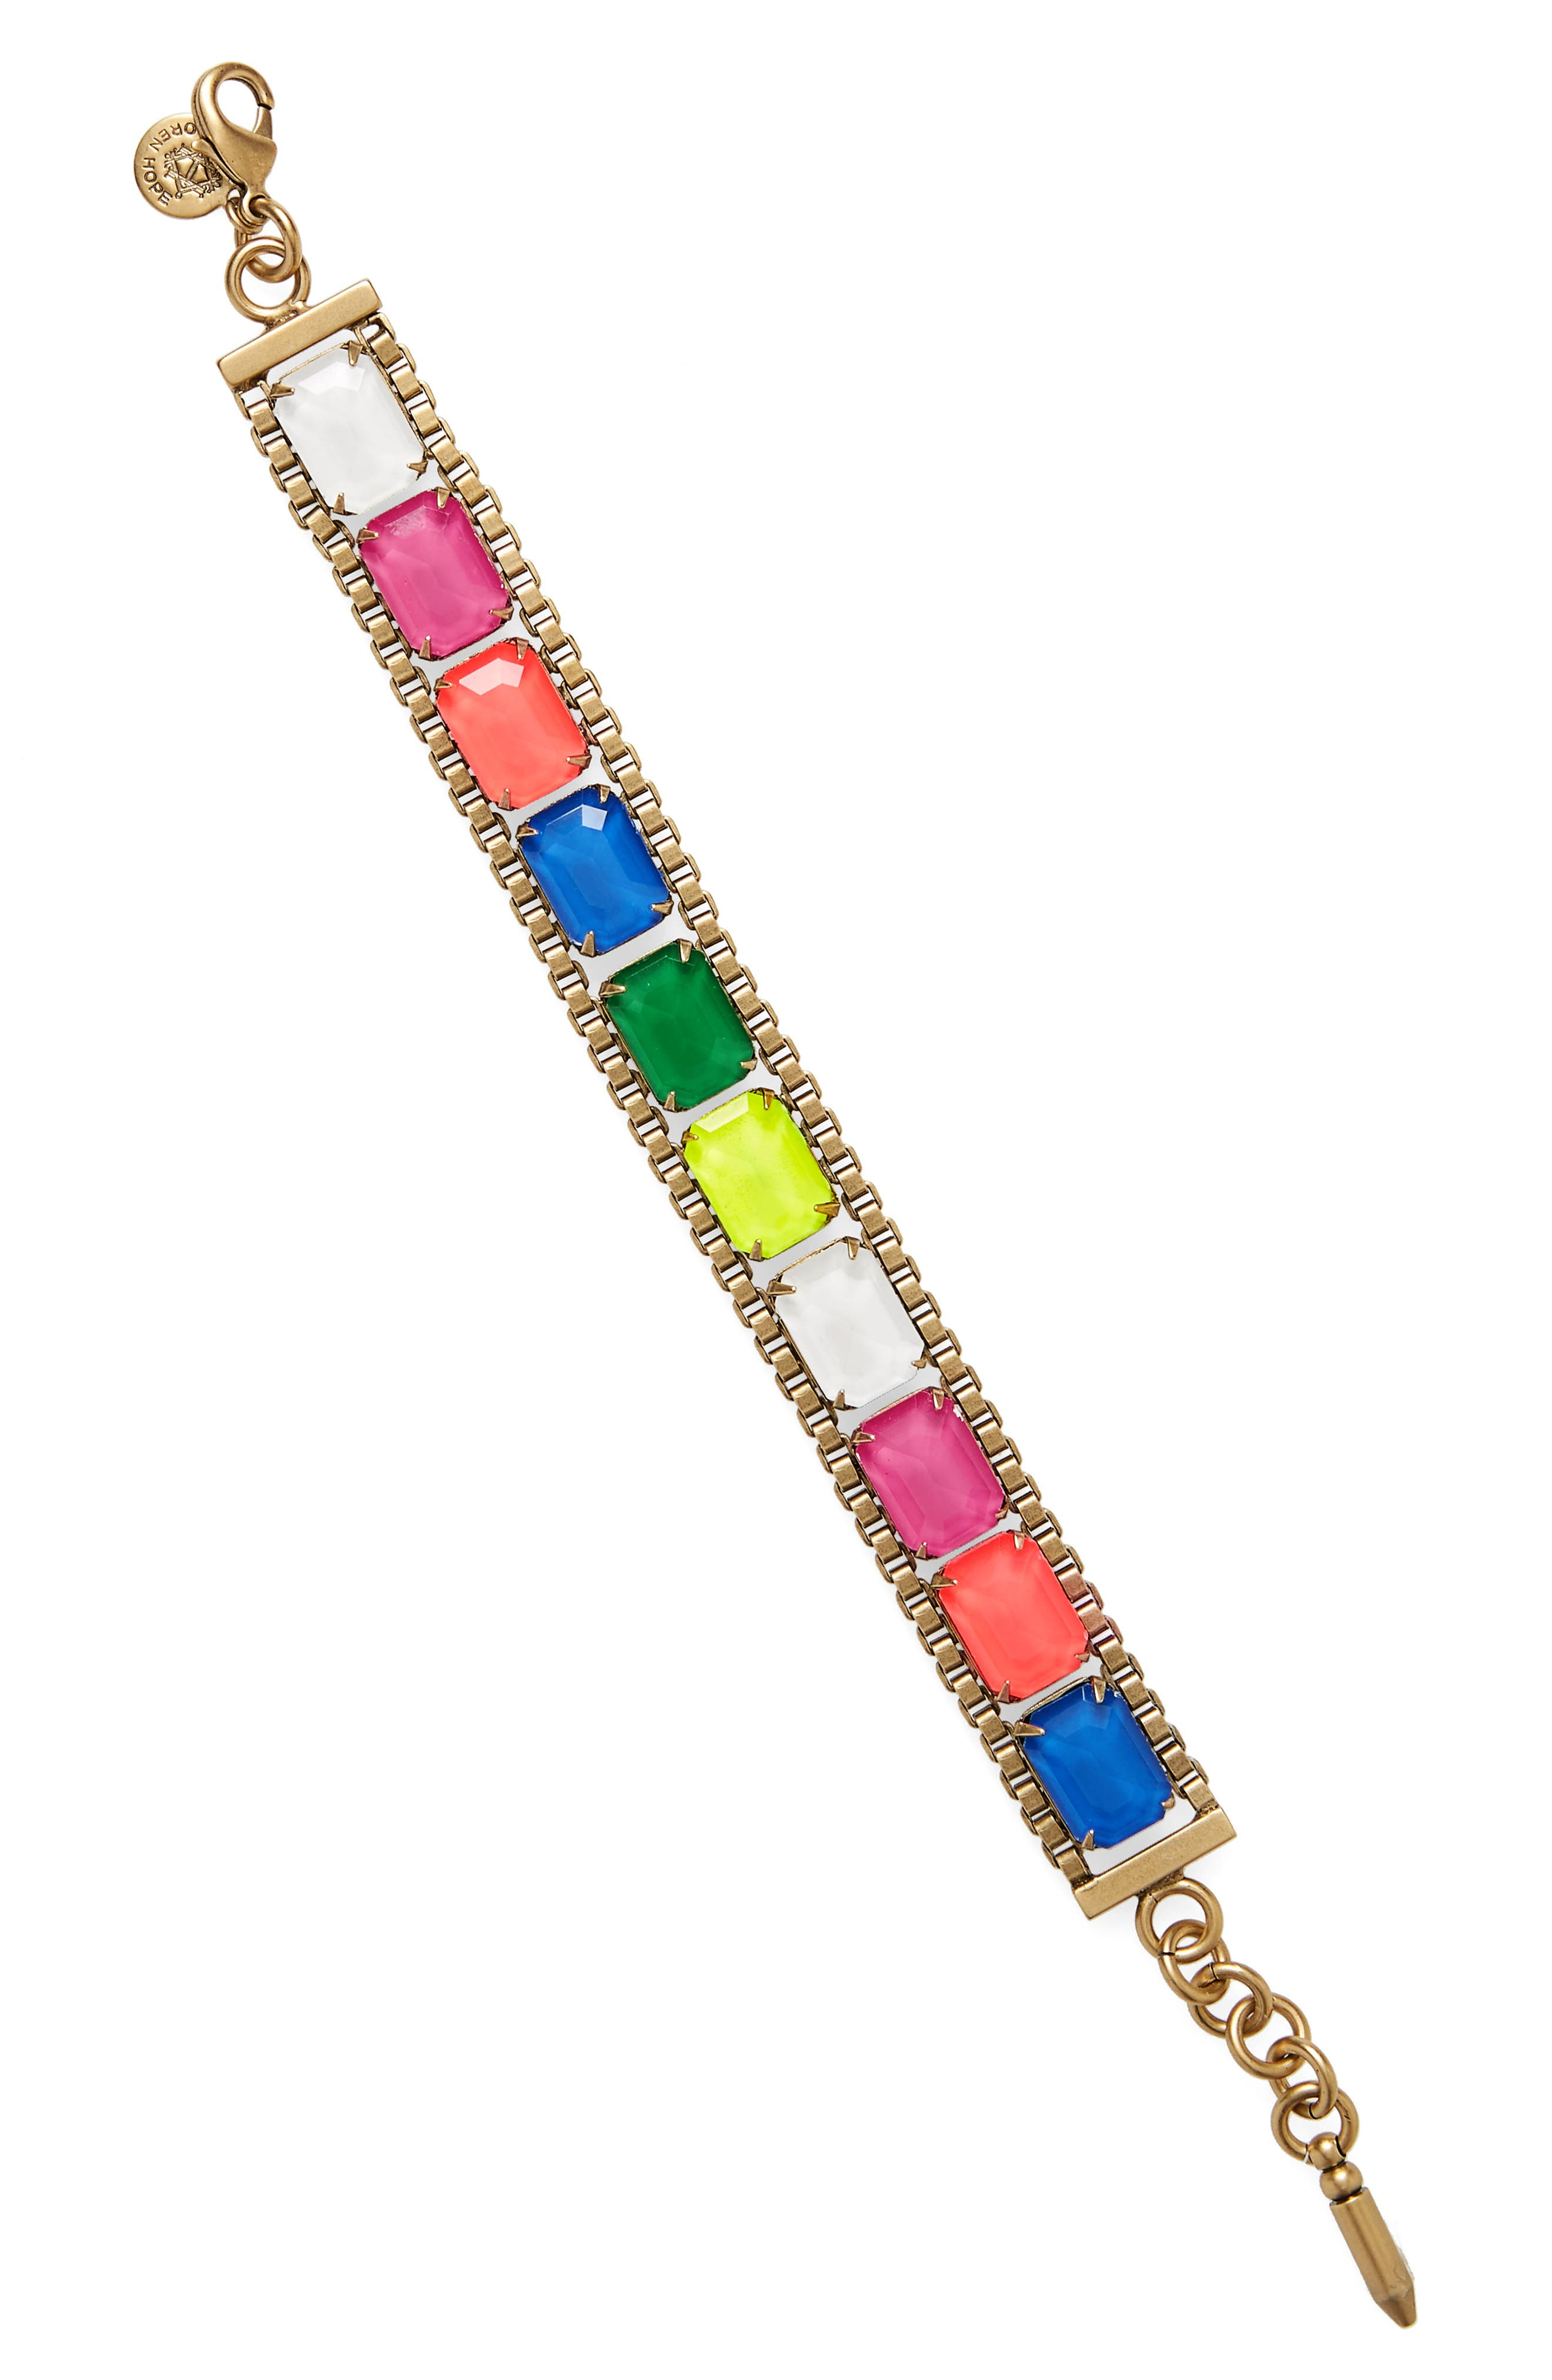 Alternate Image 1 Selected - Loren Hope Scarlet Mixed Jewel Bracelet